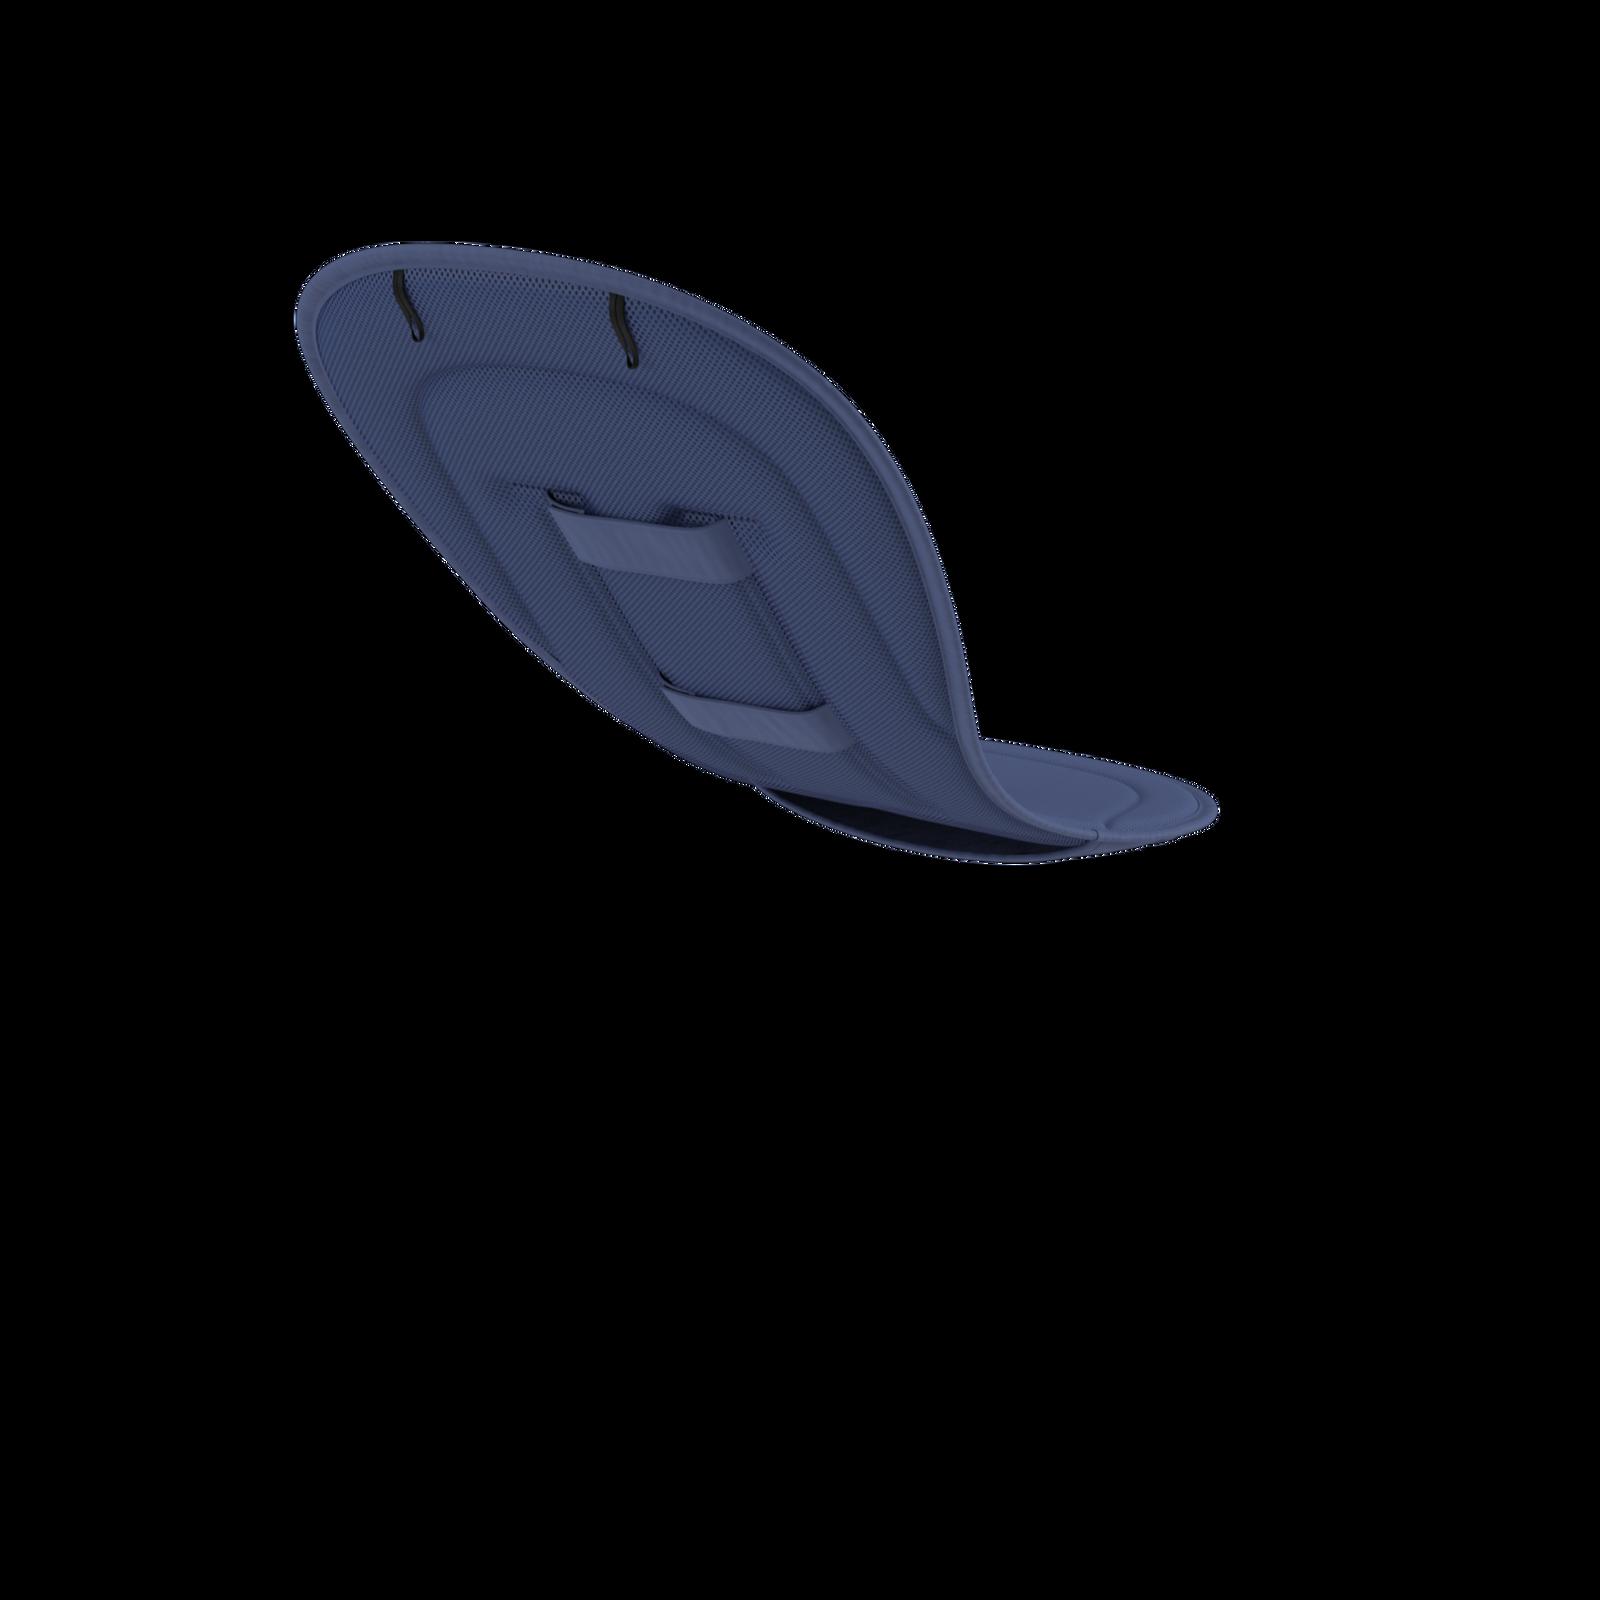 Bugaboo colchoneta integral ventilada